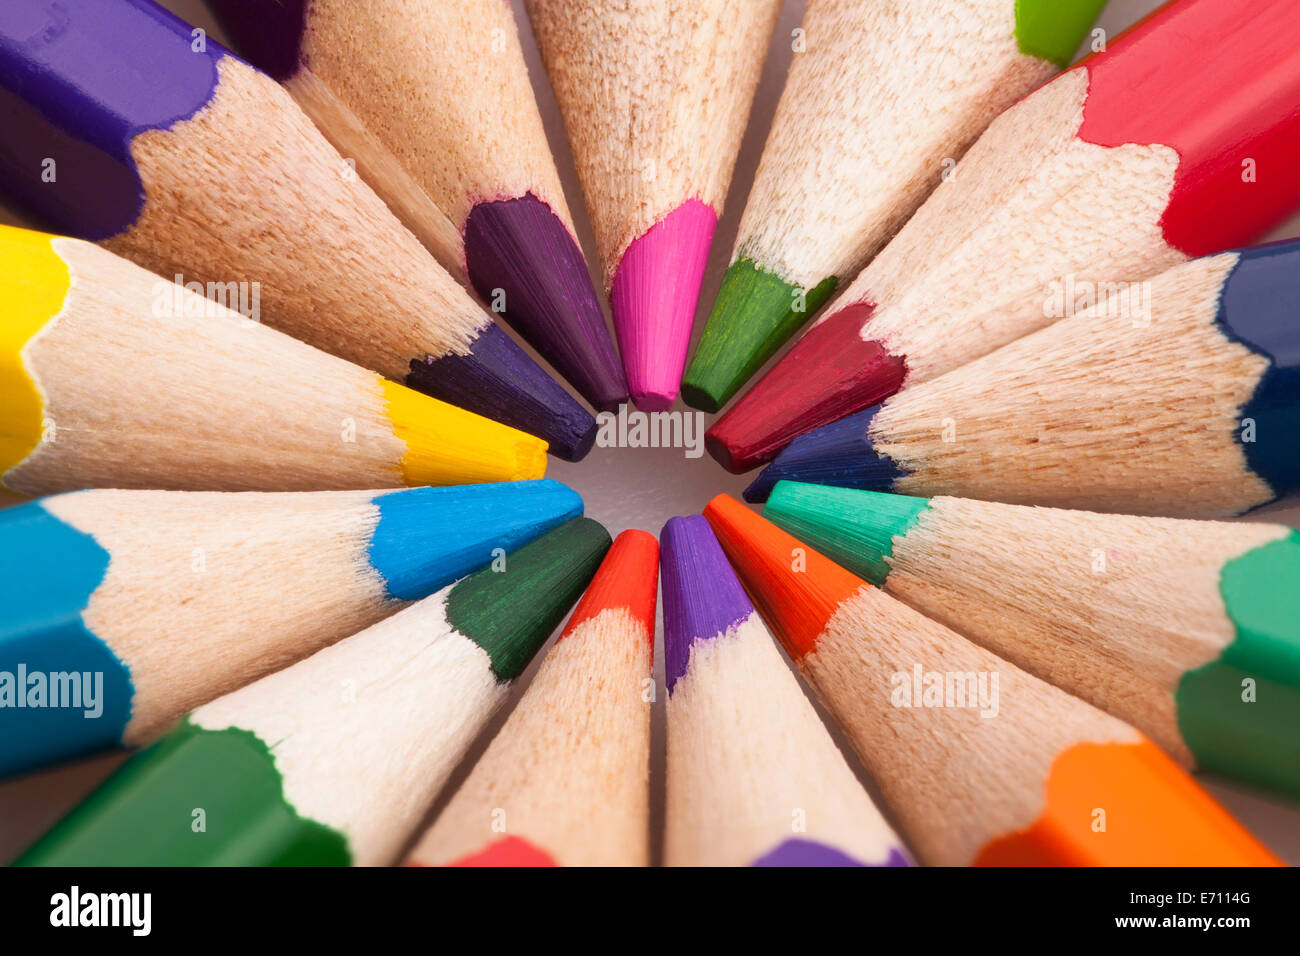 color pencils concept - Stock Image